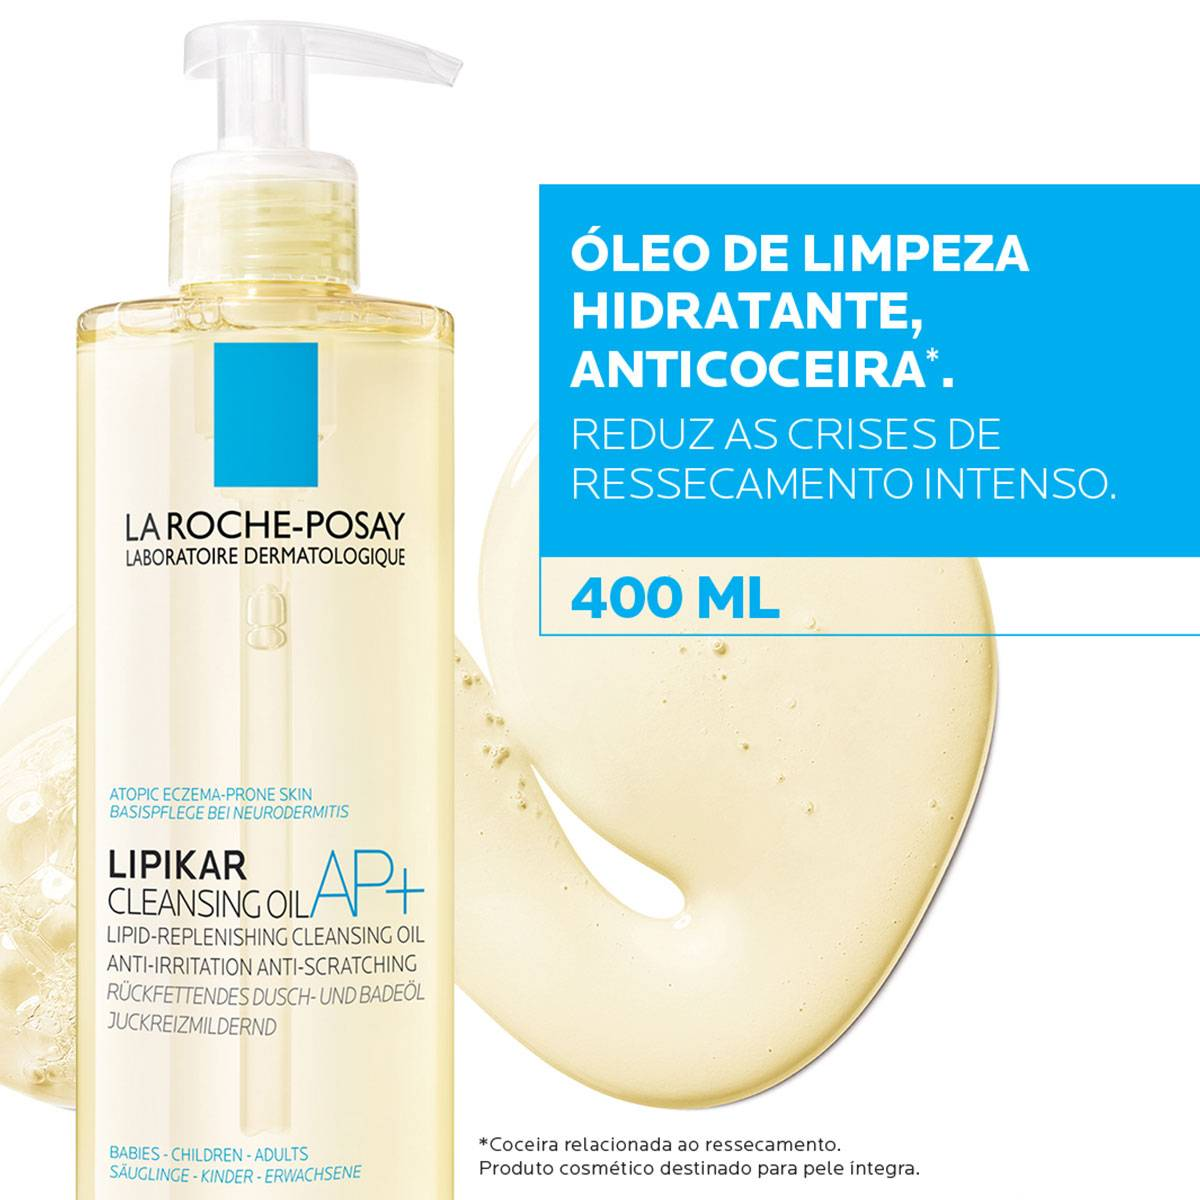 Imagem demonstrando o novo Lipikar Cleasing Oil AP+ 400ml | La Roche-Posay